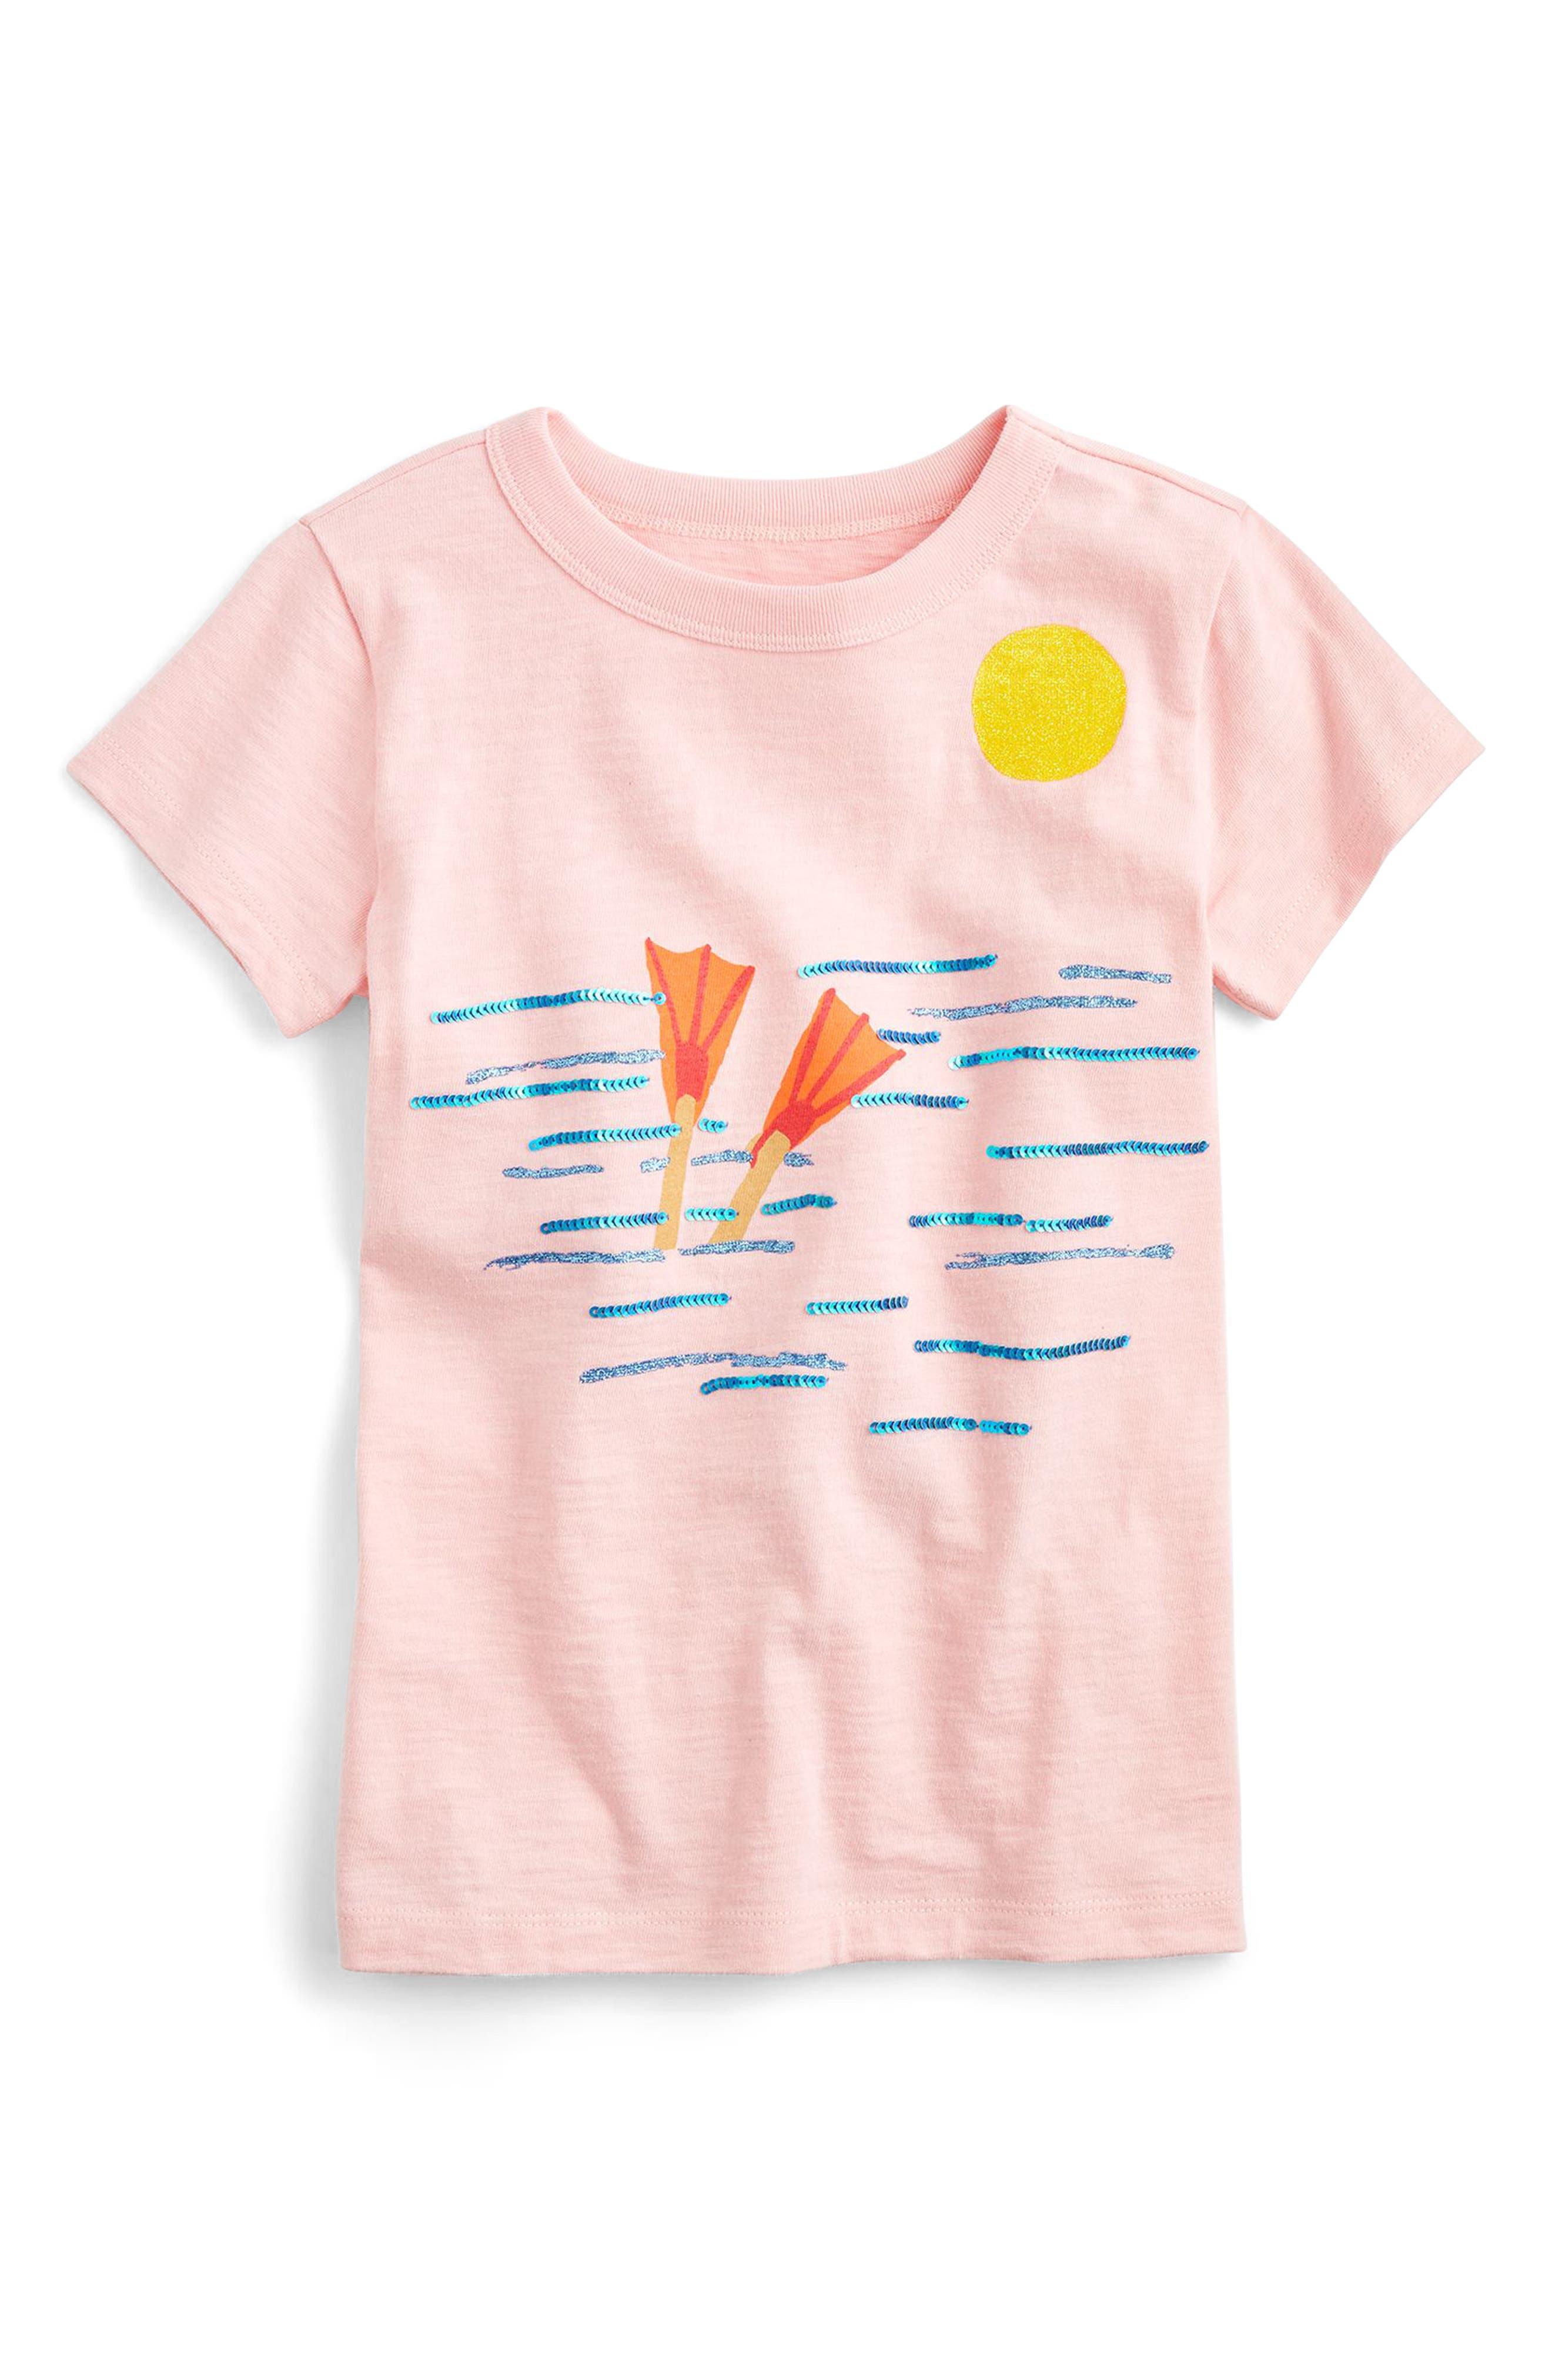 Diver Cotton Tee,                             Main thumbnail 1, color,                             Beach Pink